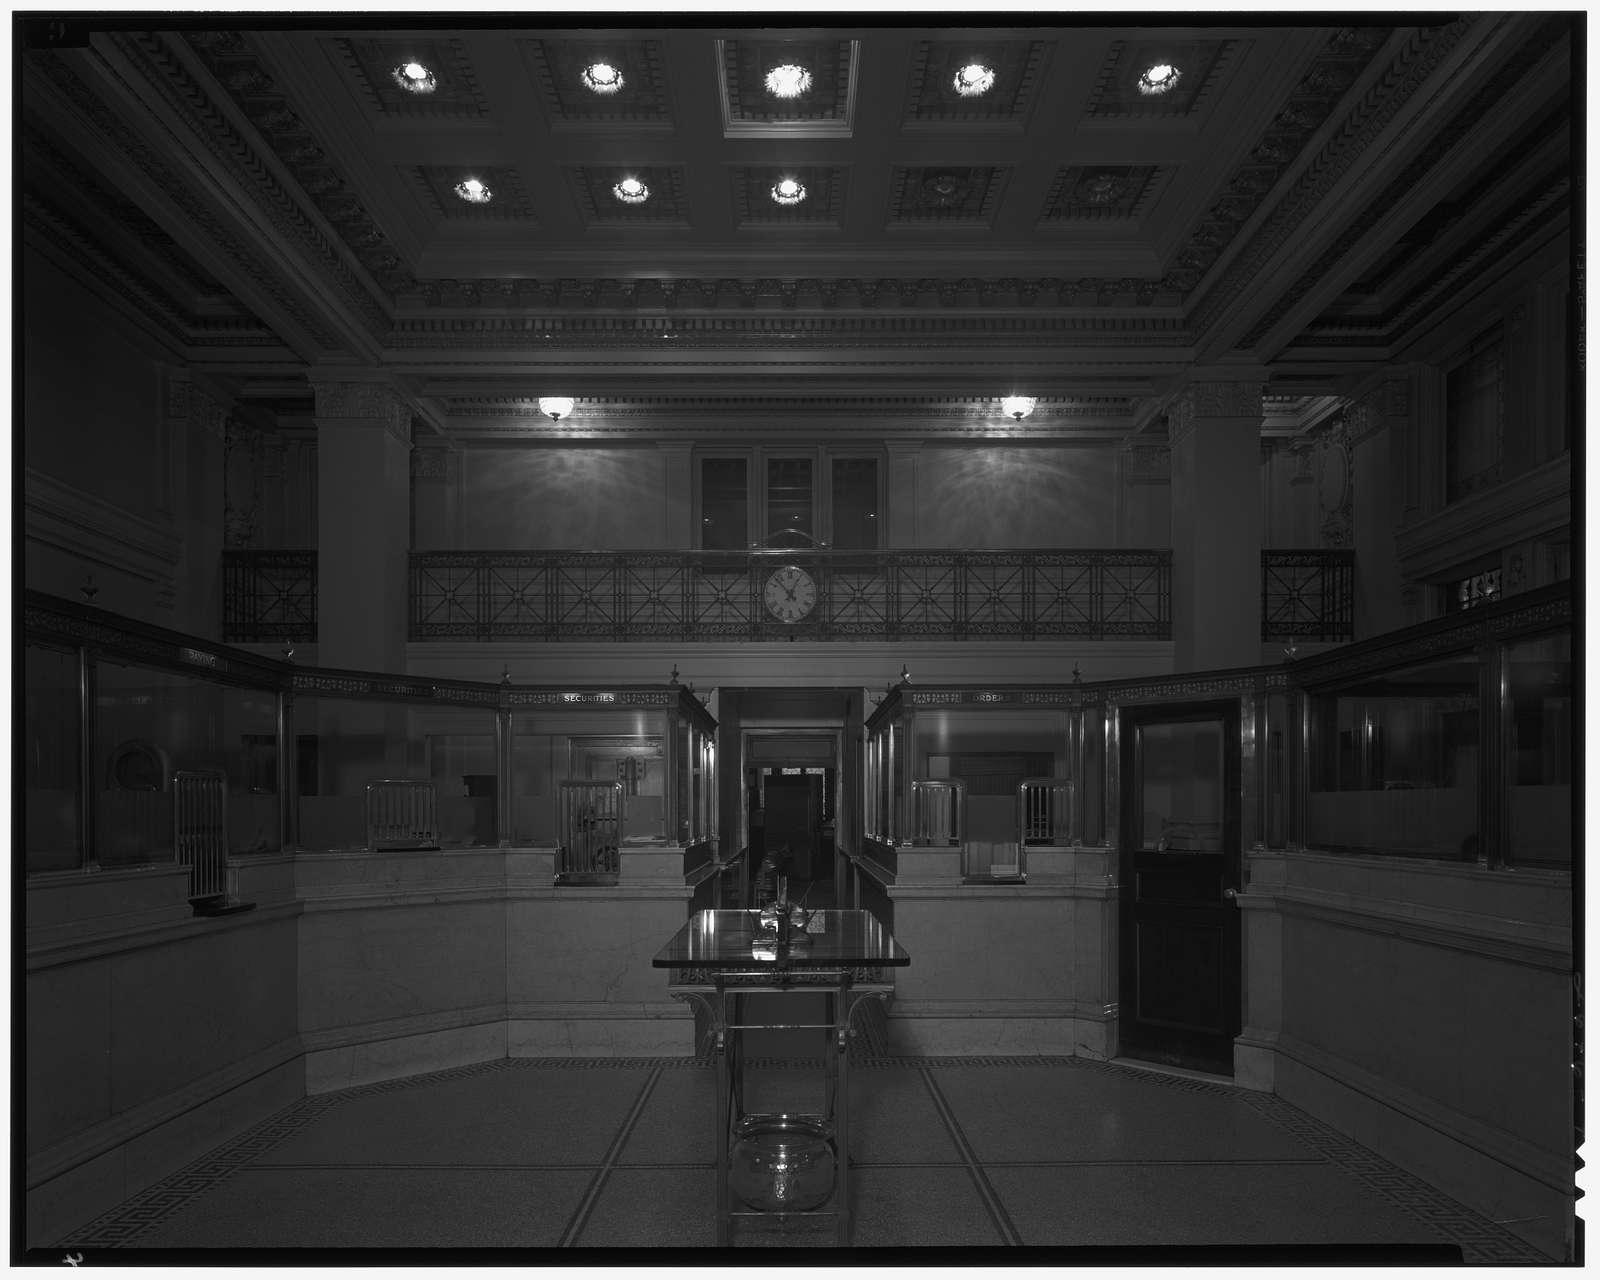 Hibbs Building, 15th St. and Pennsylvania Ave. Interior of Hibbs Building III